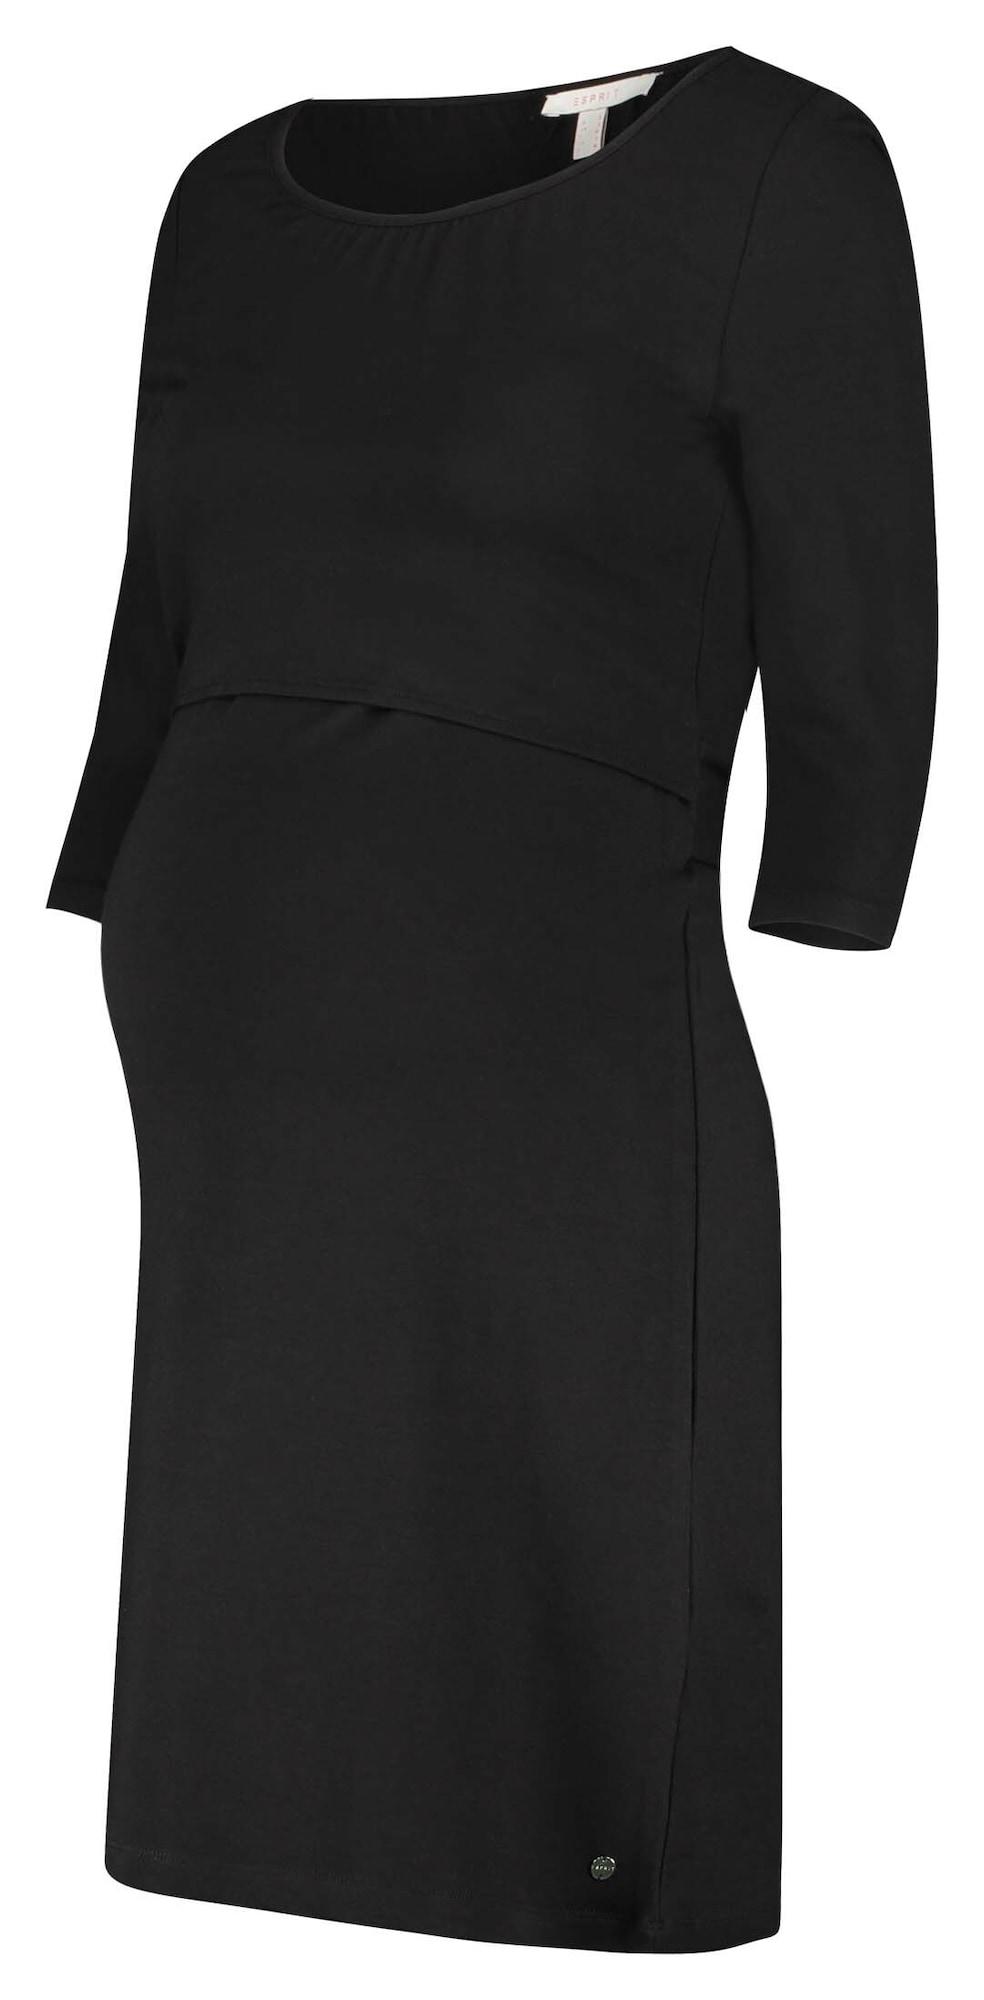 Esprit Maternity Suknelė juoda